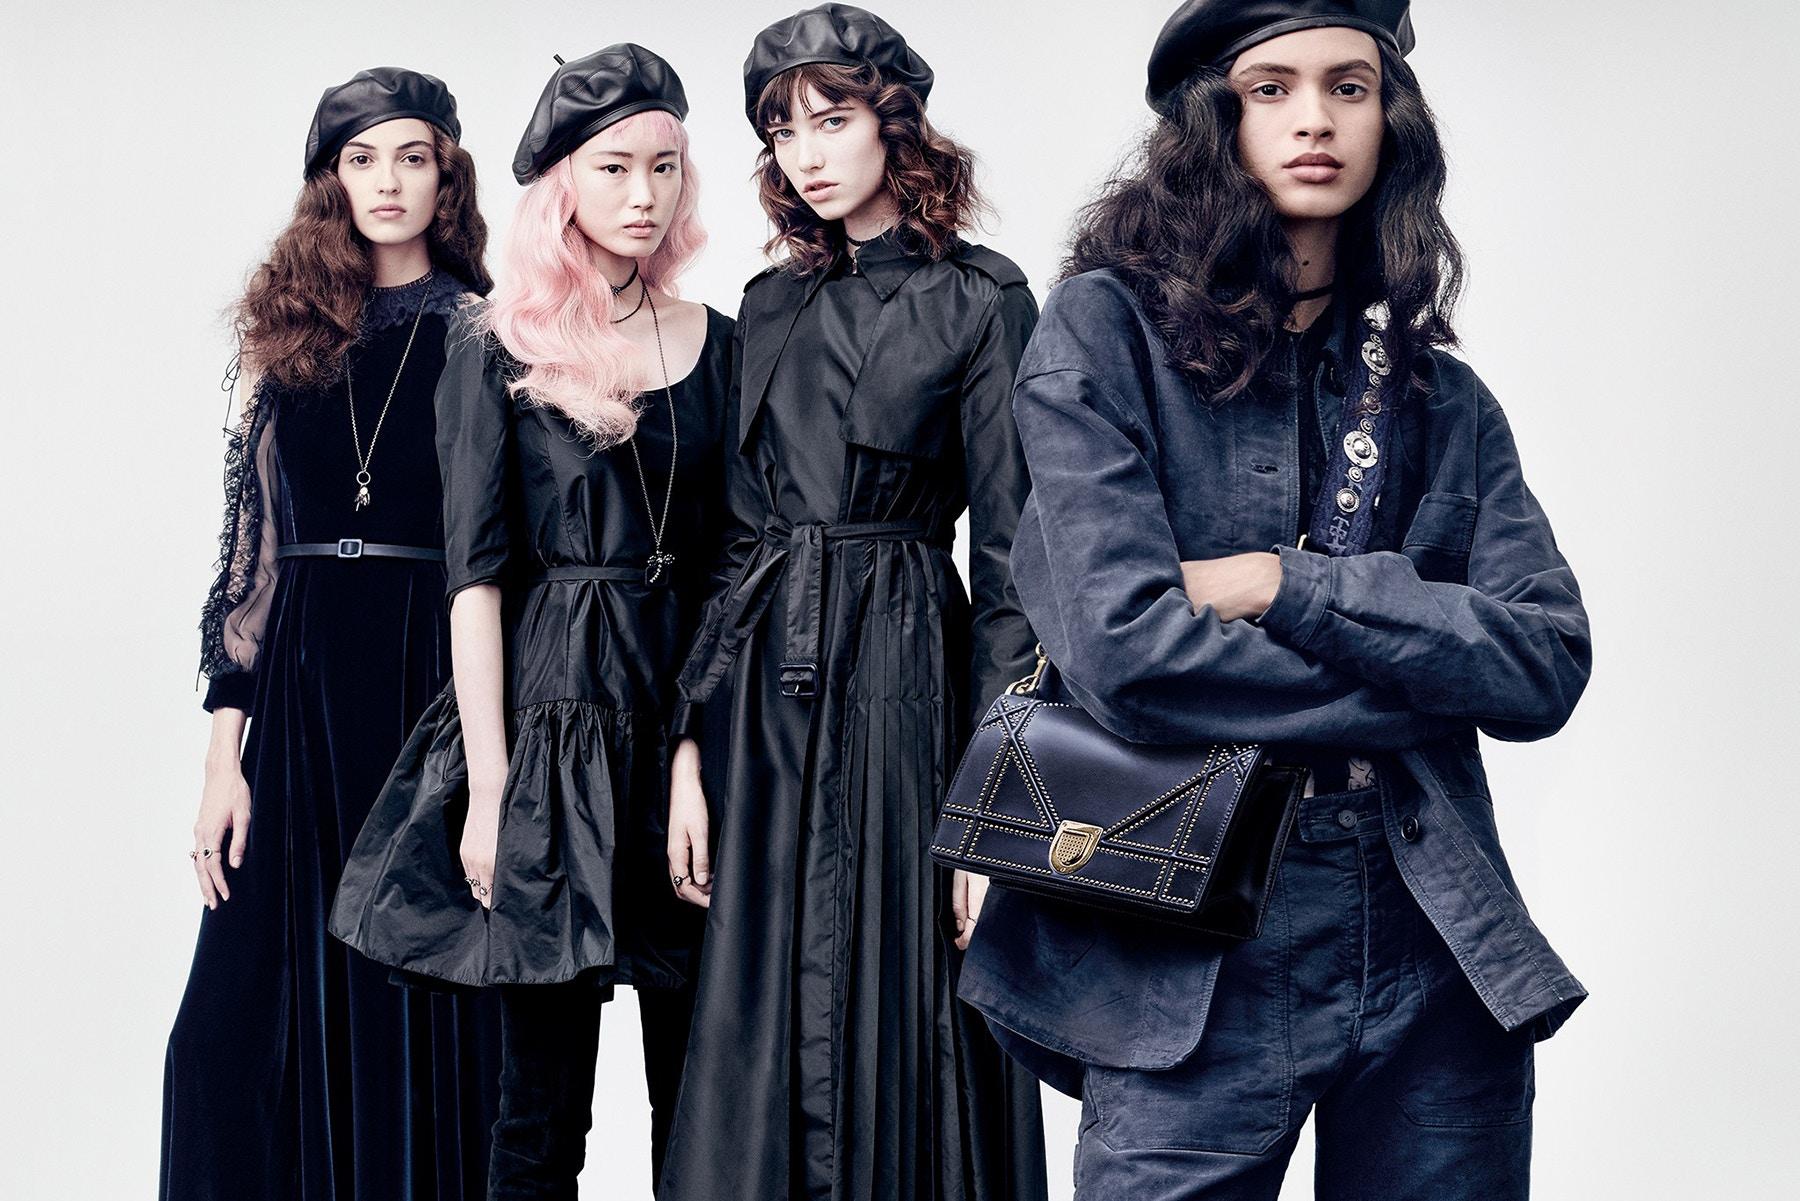 013278c302 Dior Fall Winter 2017 18 Campaign Continues Spotlight on Feminism ...